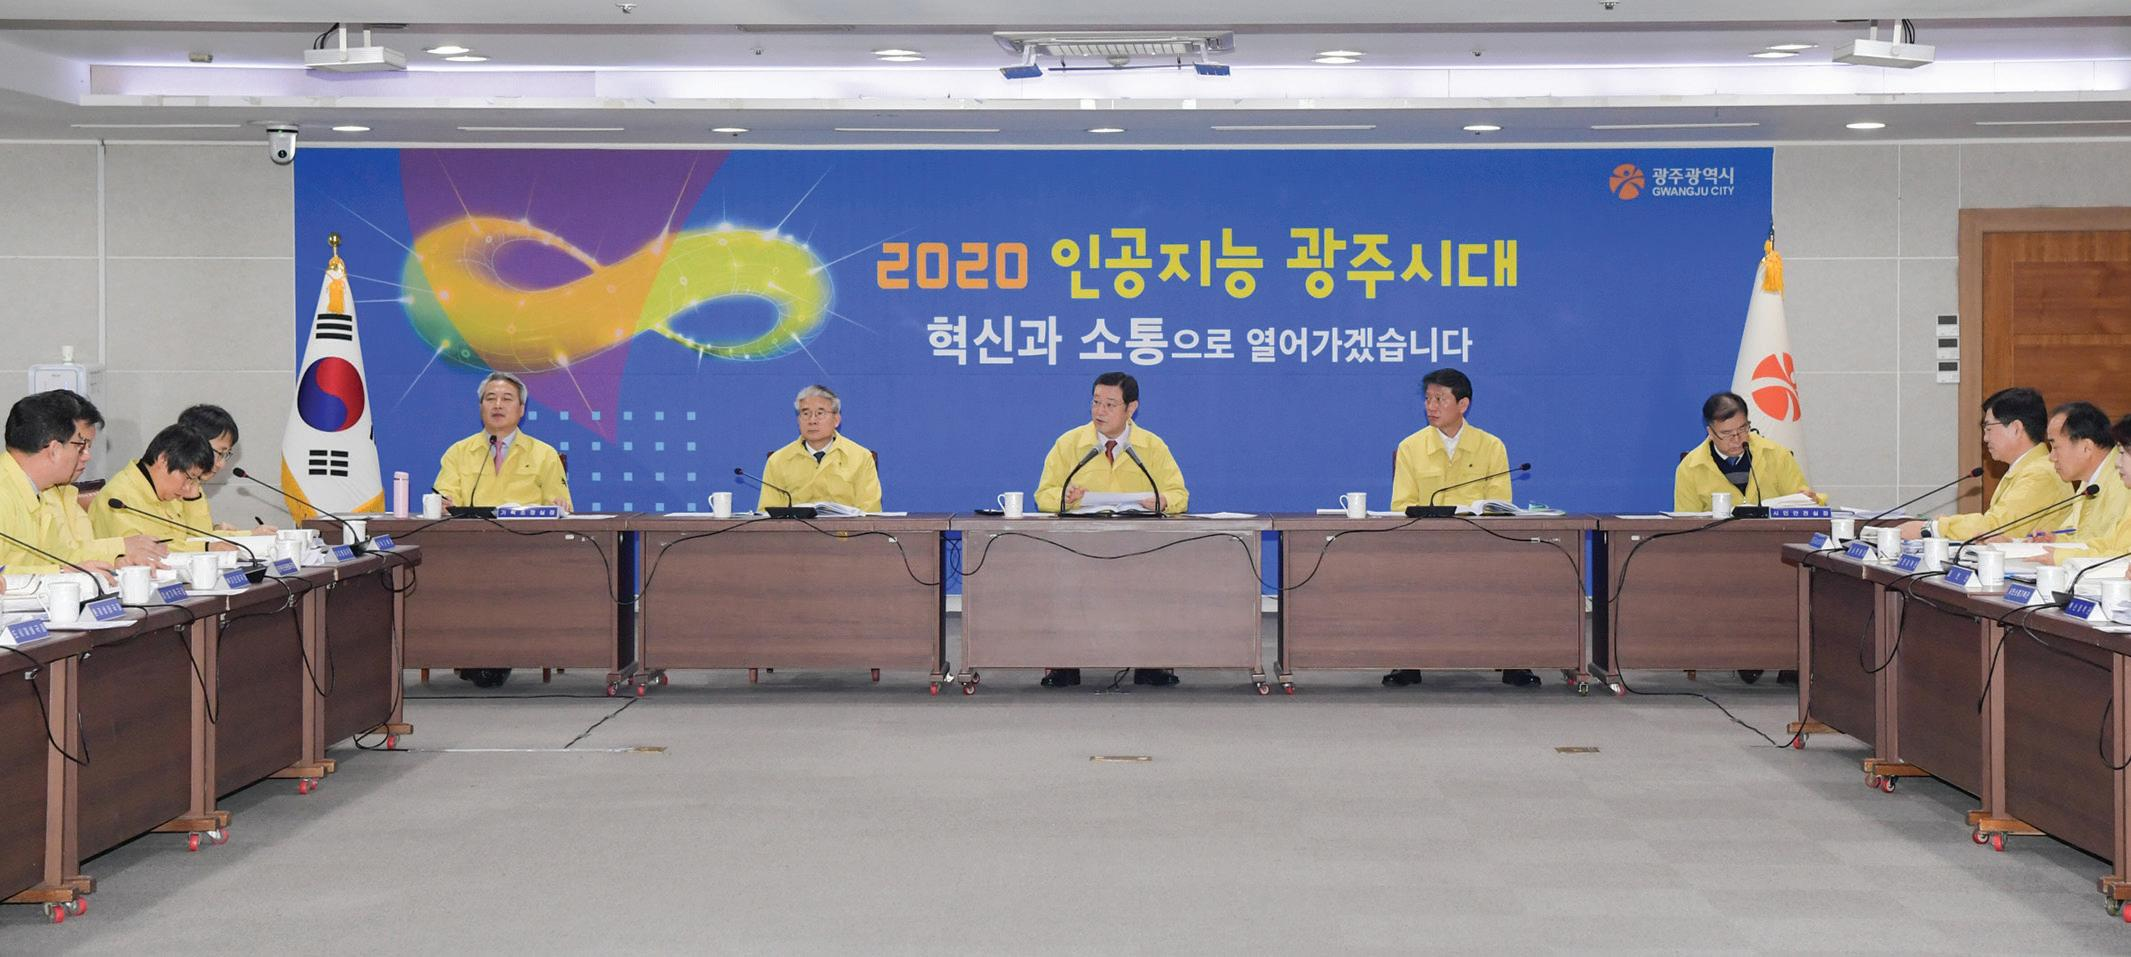 Page 6 of Gwangju City News